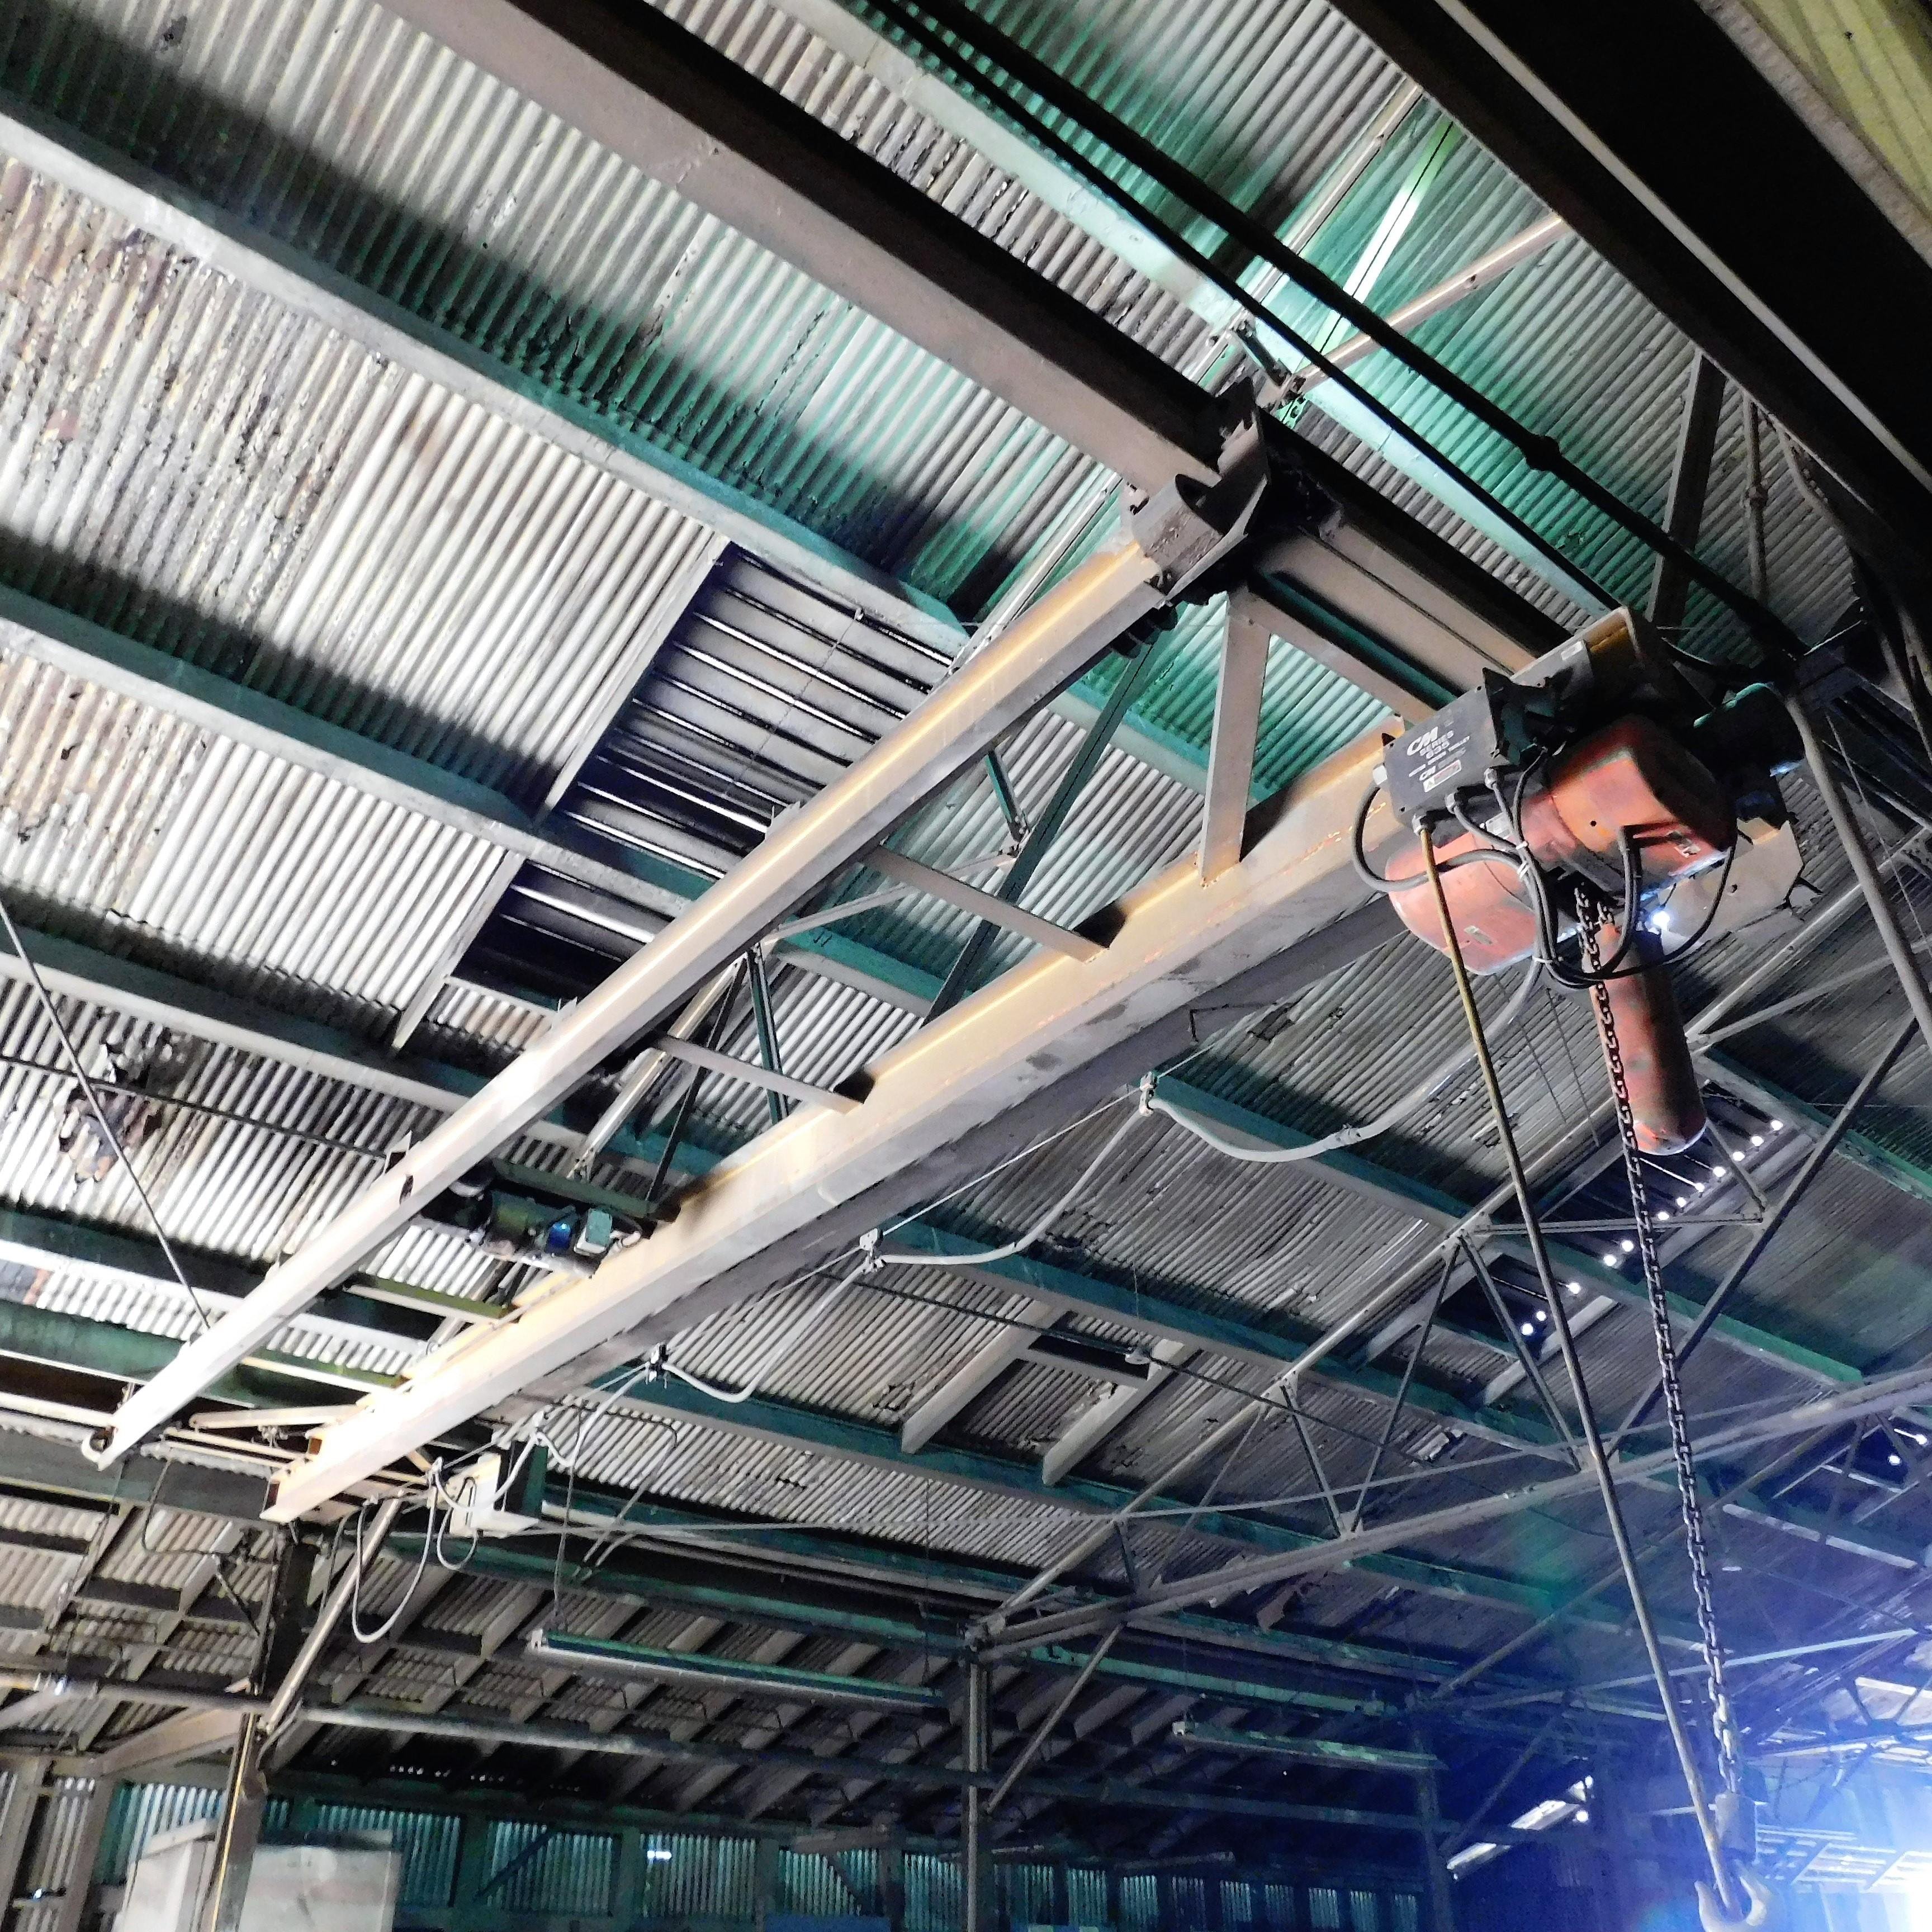 Lot 18 - APPROX. 22' SPAN UNDERSLUNG BRIDGE W/ C/M 1-TON ELECTRIC HOIST W/ 3-WAY PENDANT CONTROLS